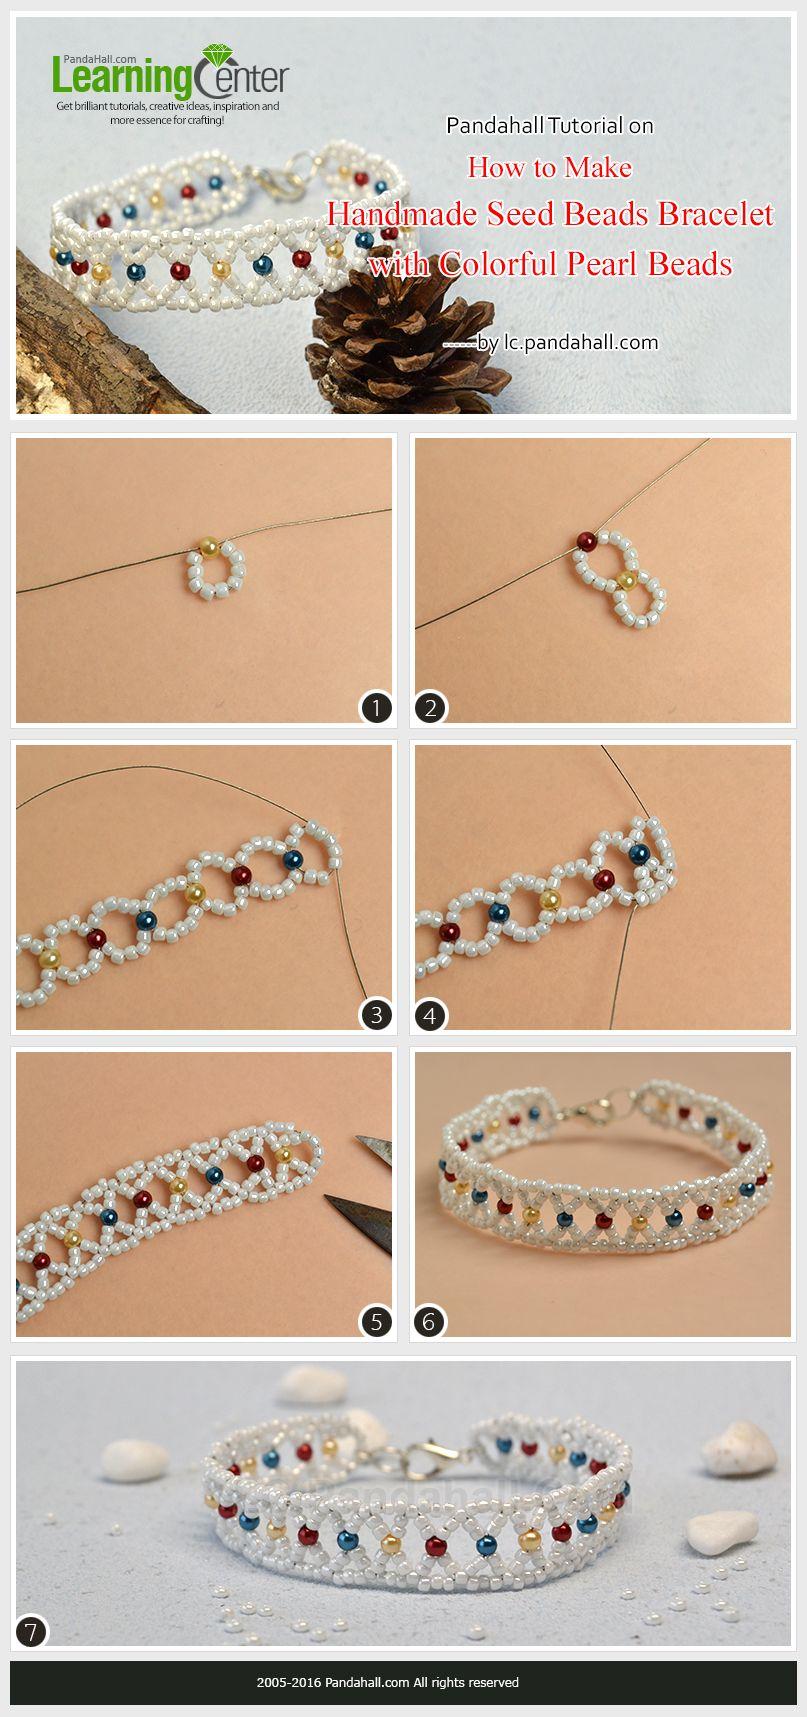 Pandahall tutorial on how to make handmade seed beads bracelet with